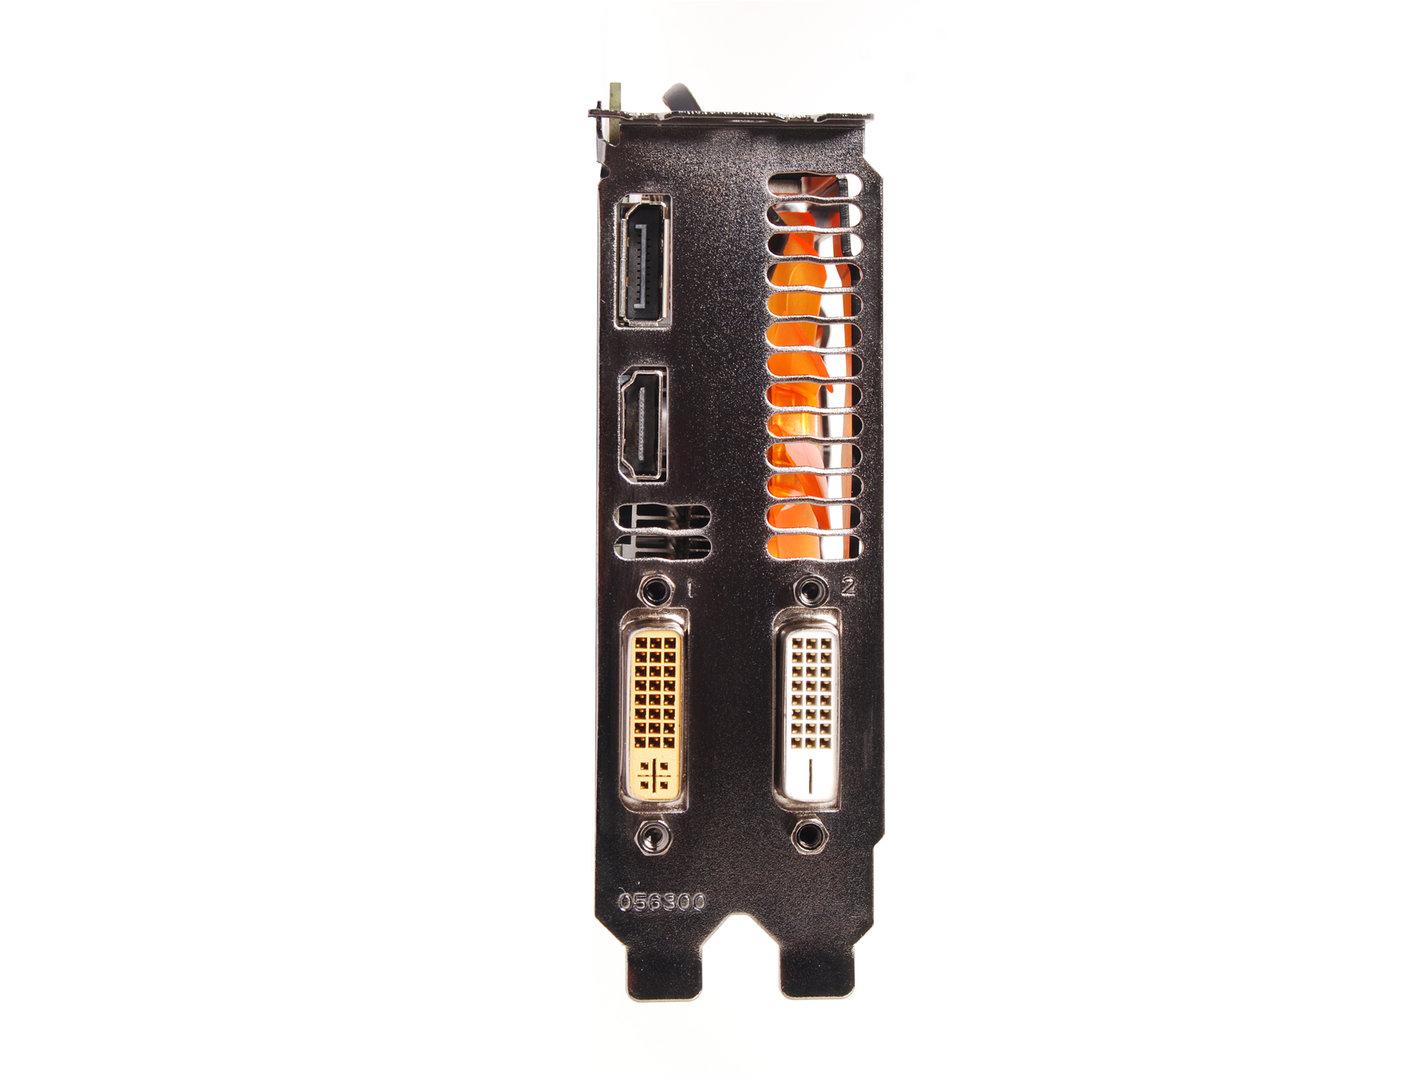 Zotac GeForce GTX 660 Ti AMP!